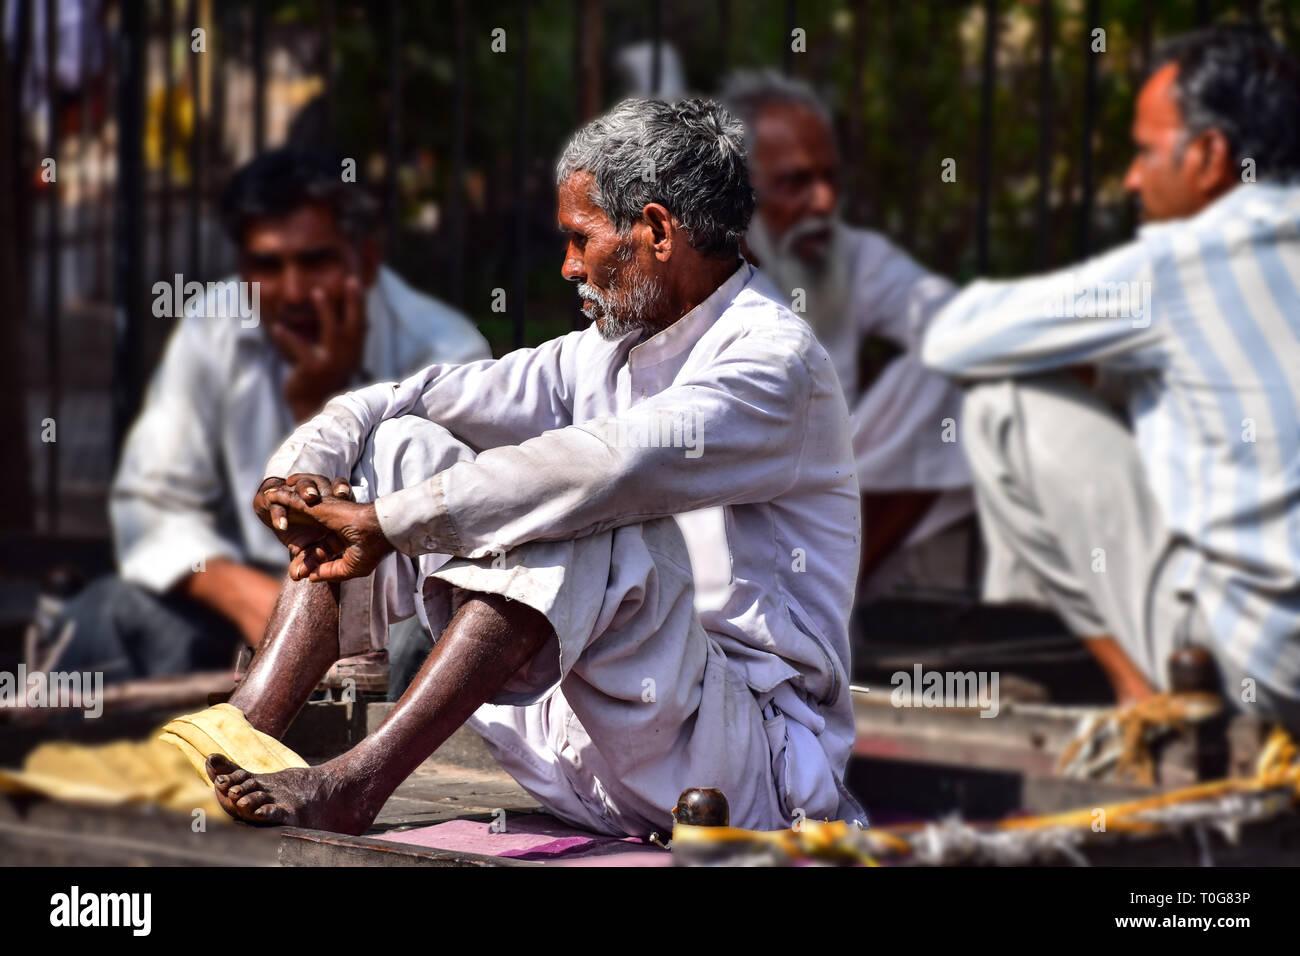 Contemplation & Reflection, Bundi, Rajasthan, India - Stock Image